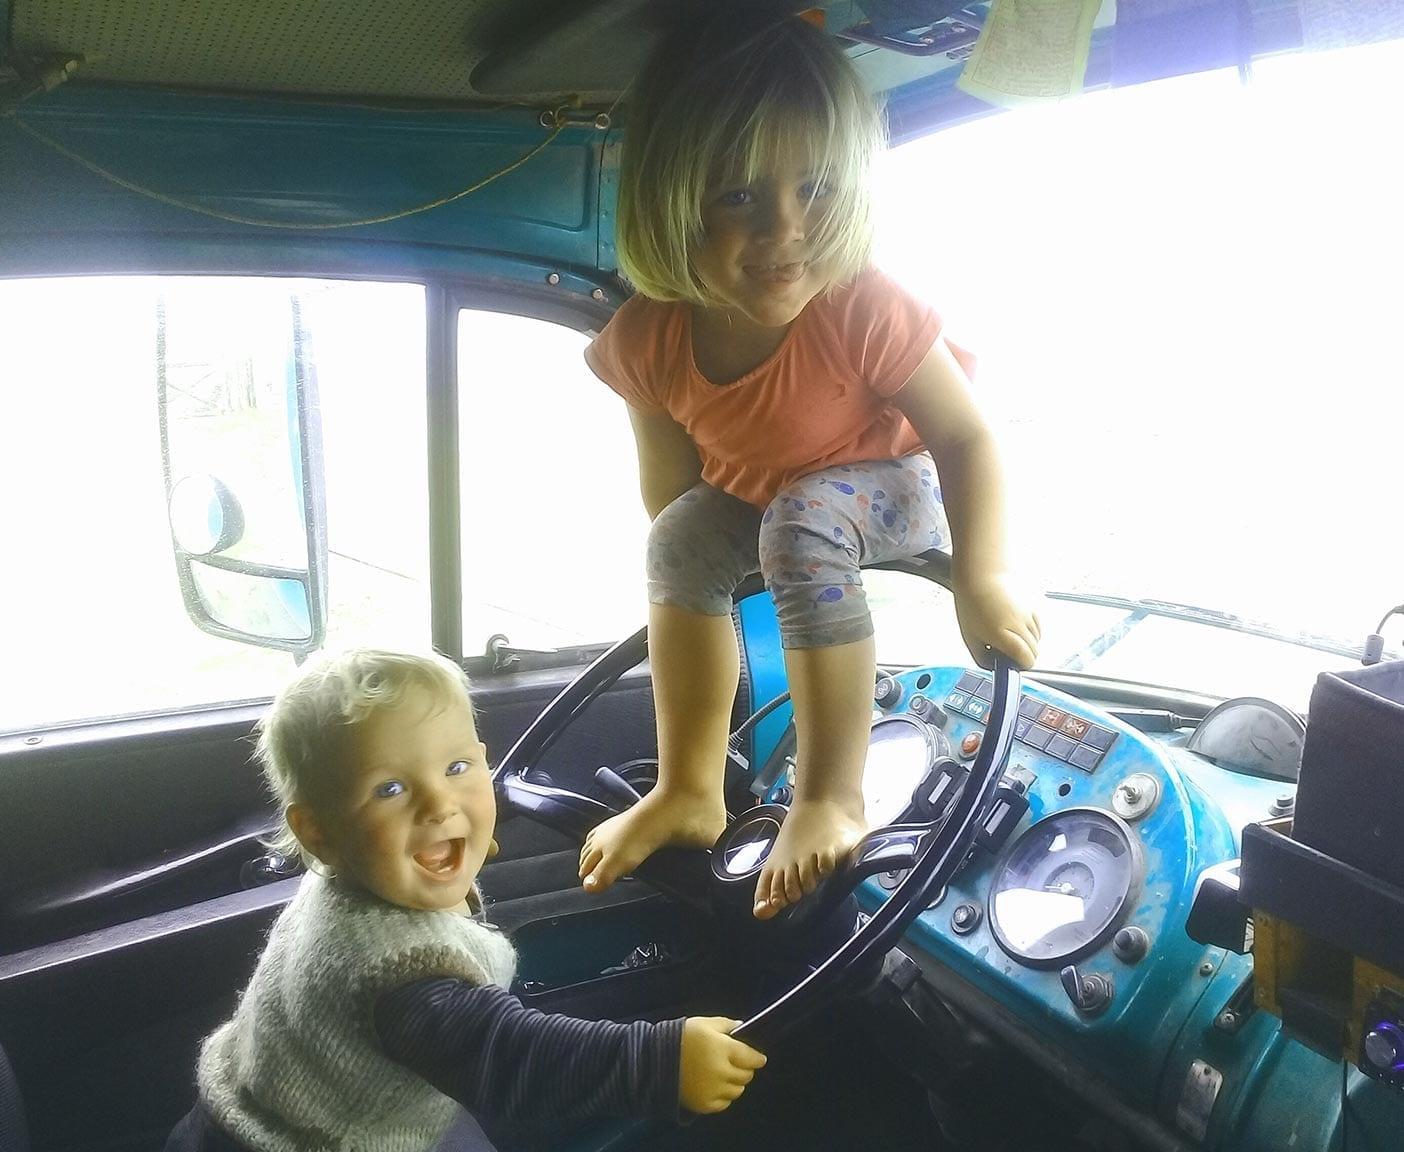 mercedes-LA-911-B-hippie-trail-kurzhauber-4x4-wohnmobil-panamericana-reisen-mit-Kindern